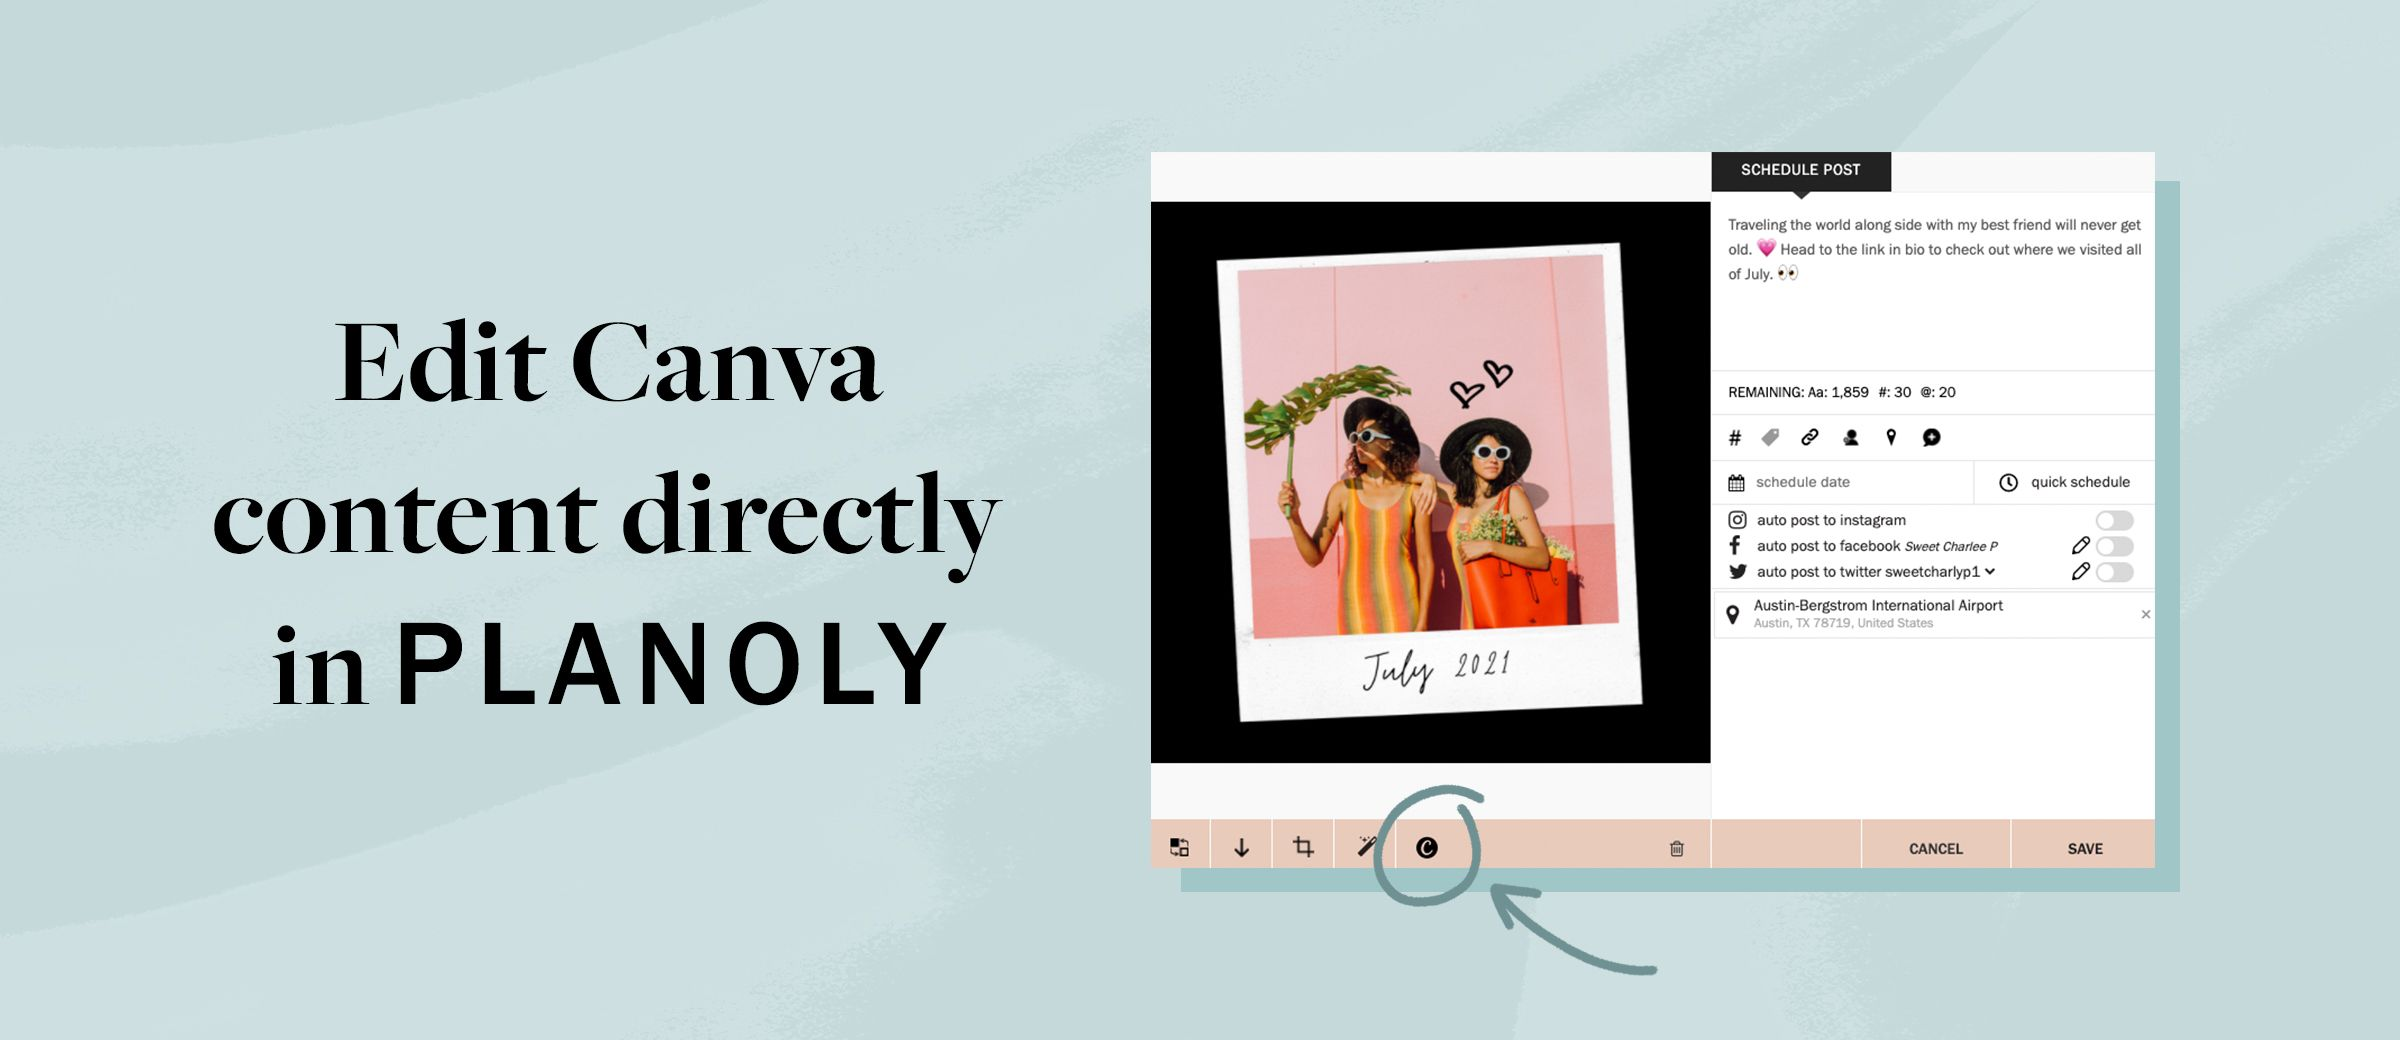 PLANOLY - Blog - Canva Integration - Additional Image